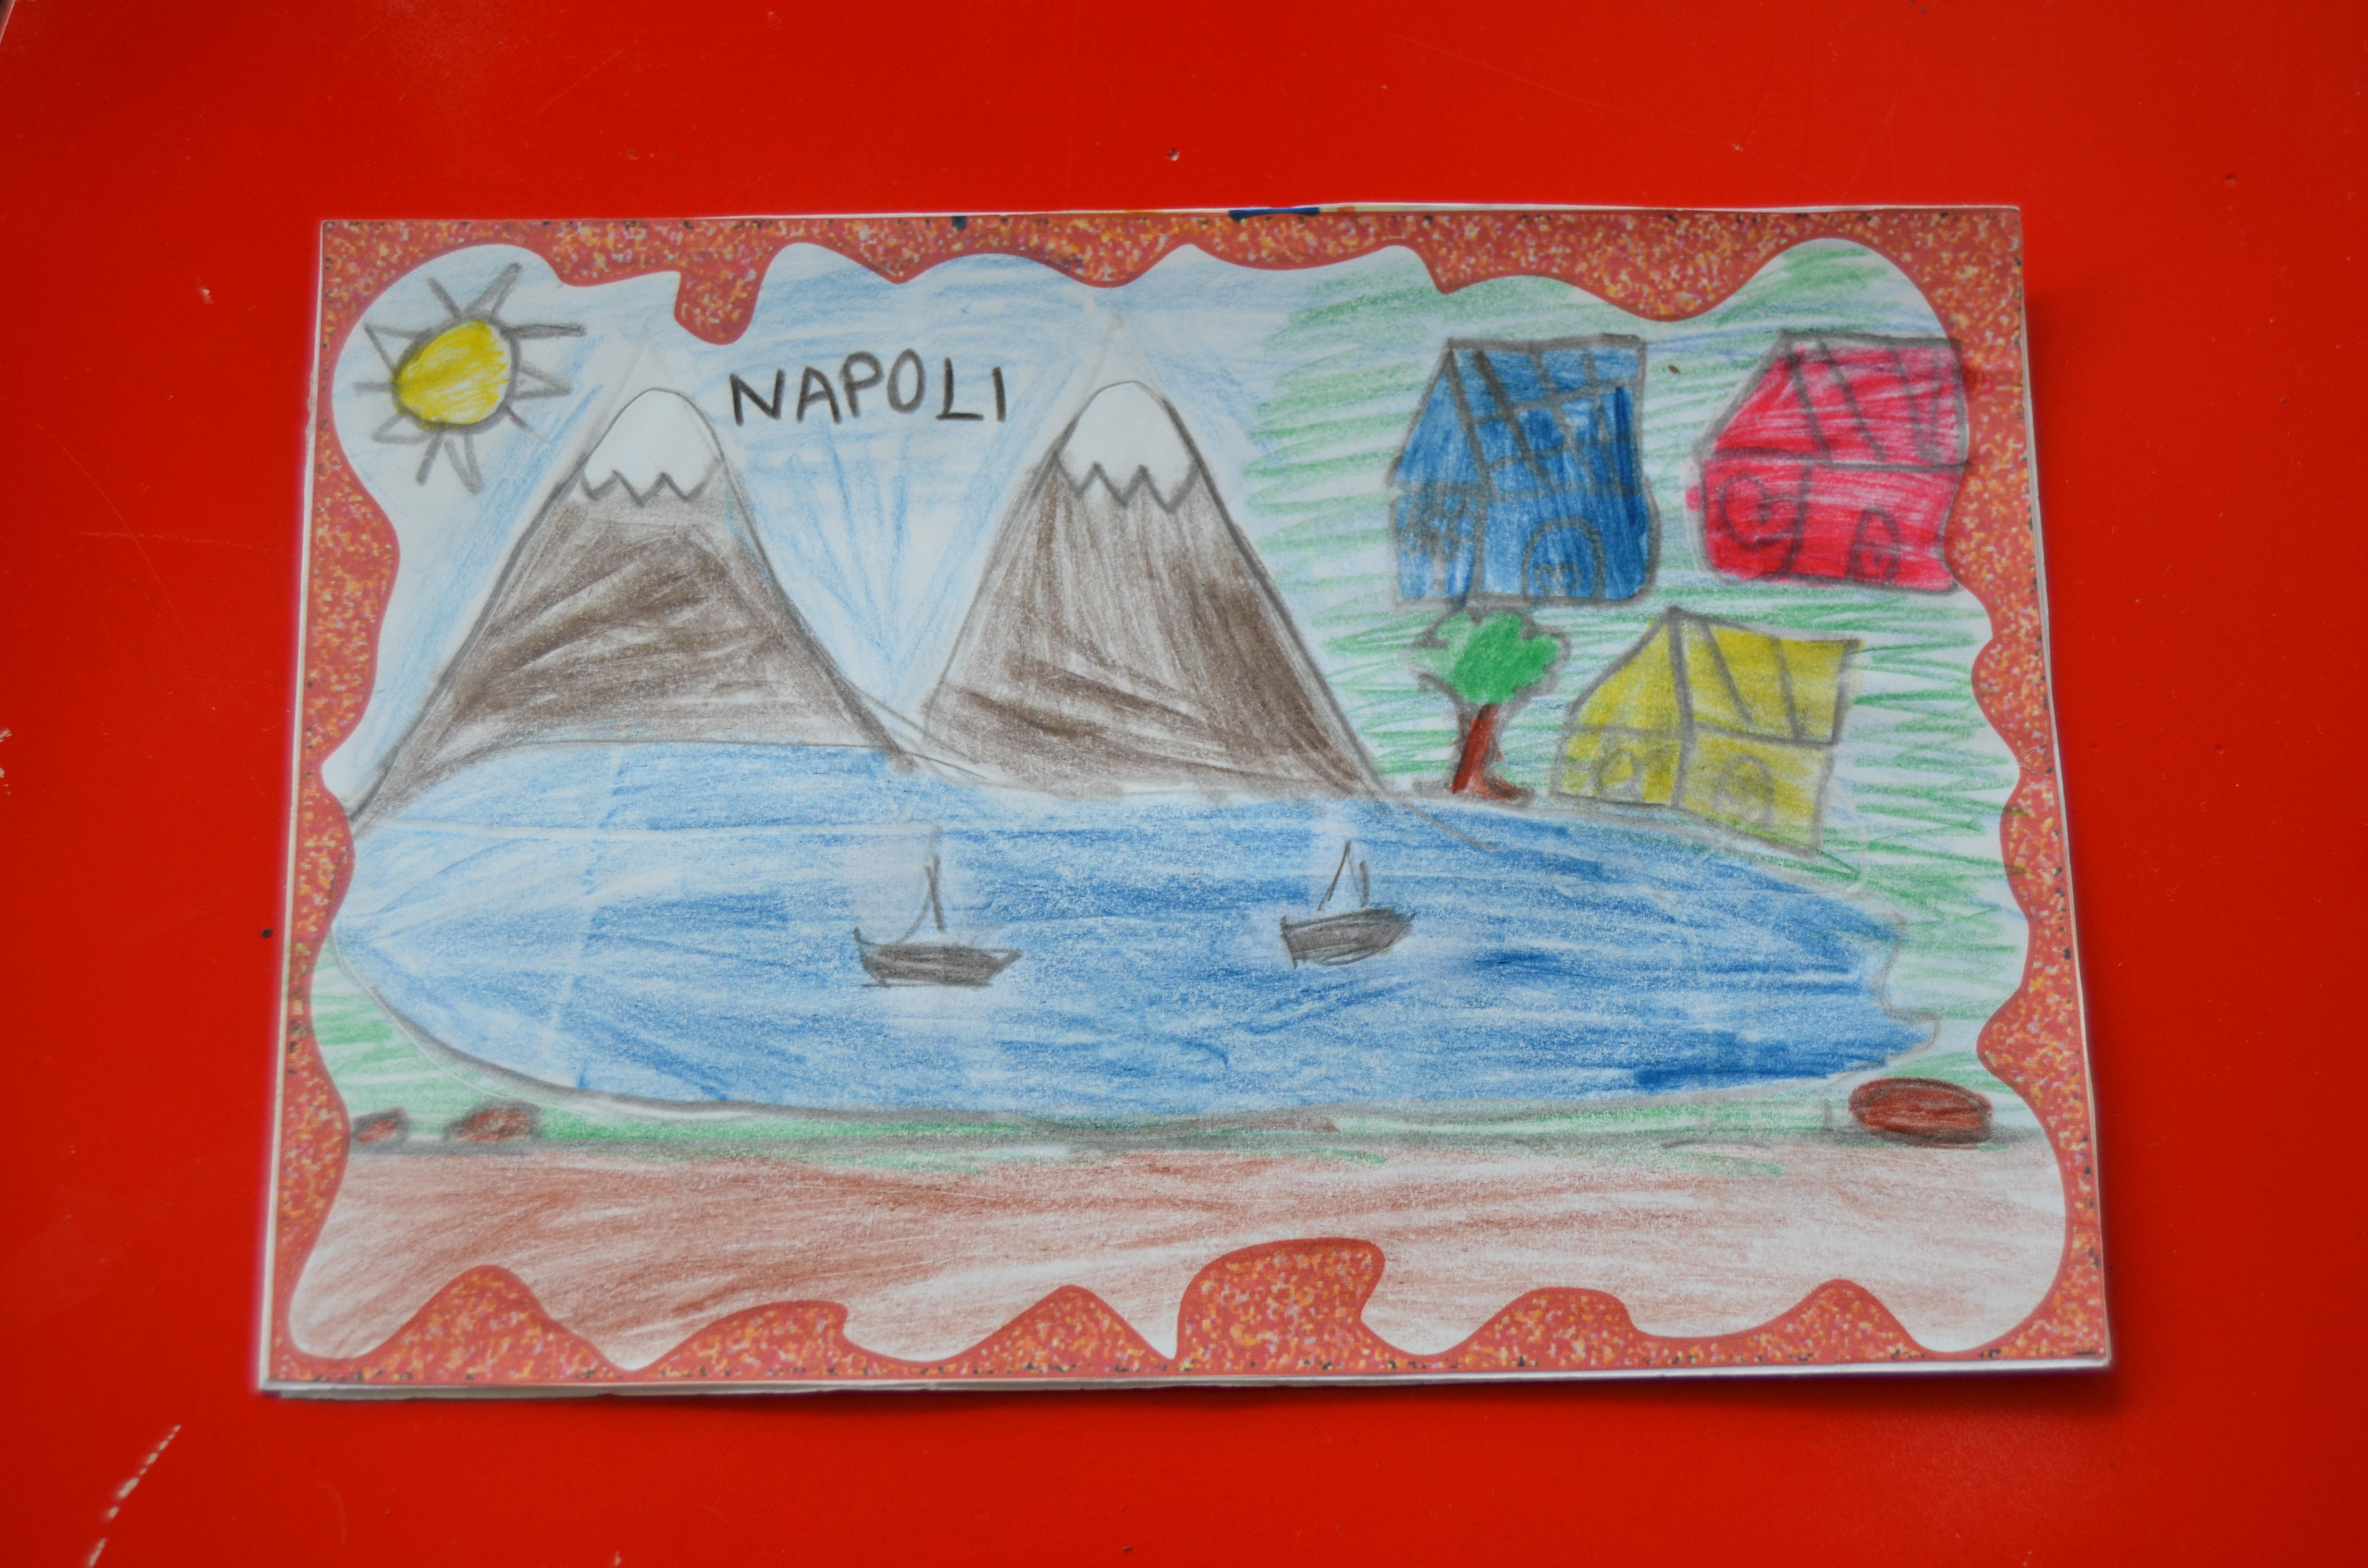 Piloting Naples